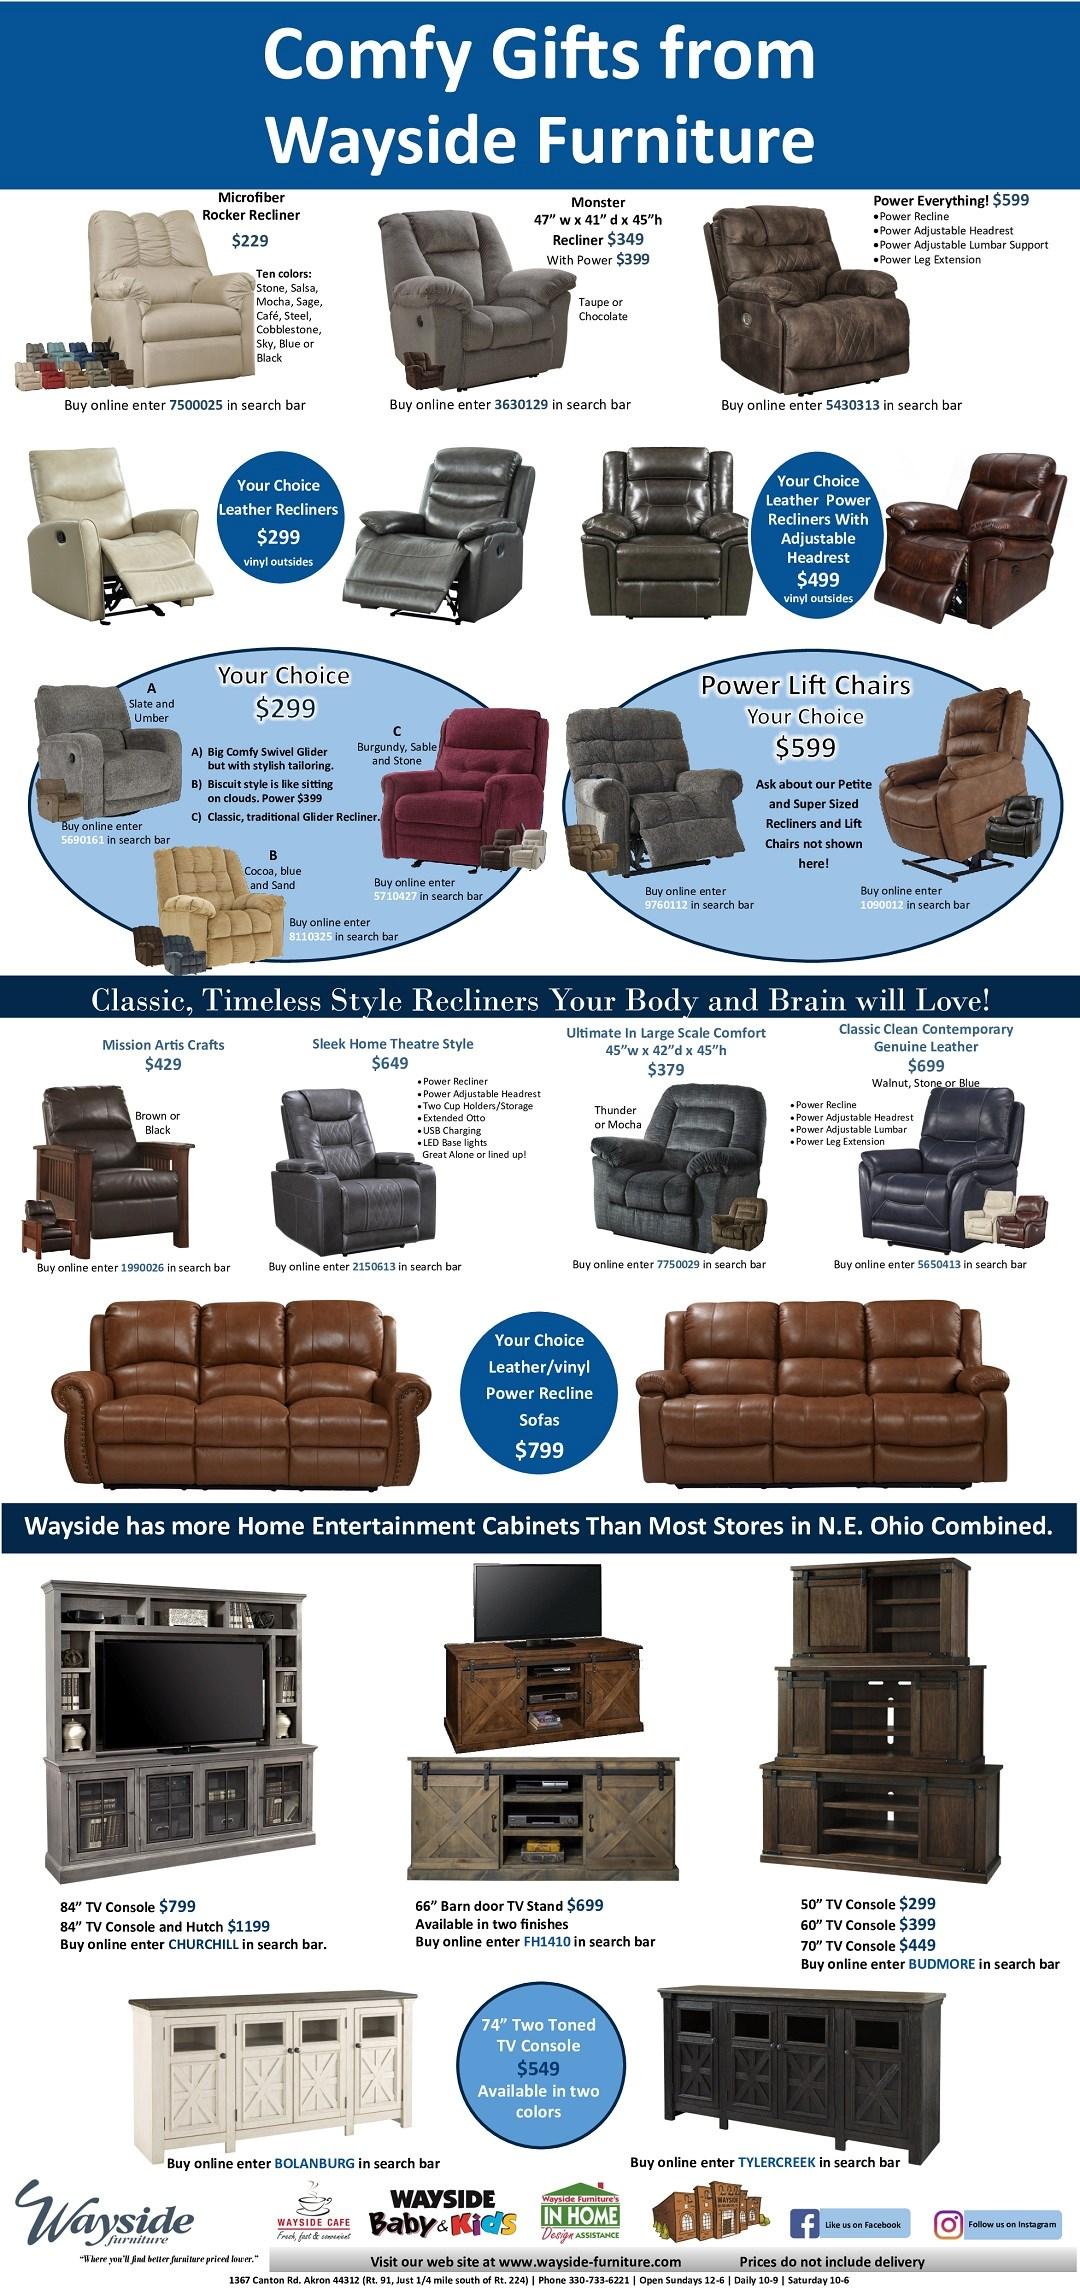 recliners, power recliners, rocker recliner, leather recliner, adjustable headrest, TV stands, TV console